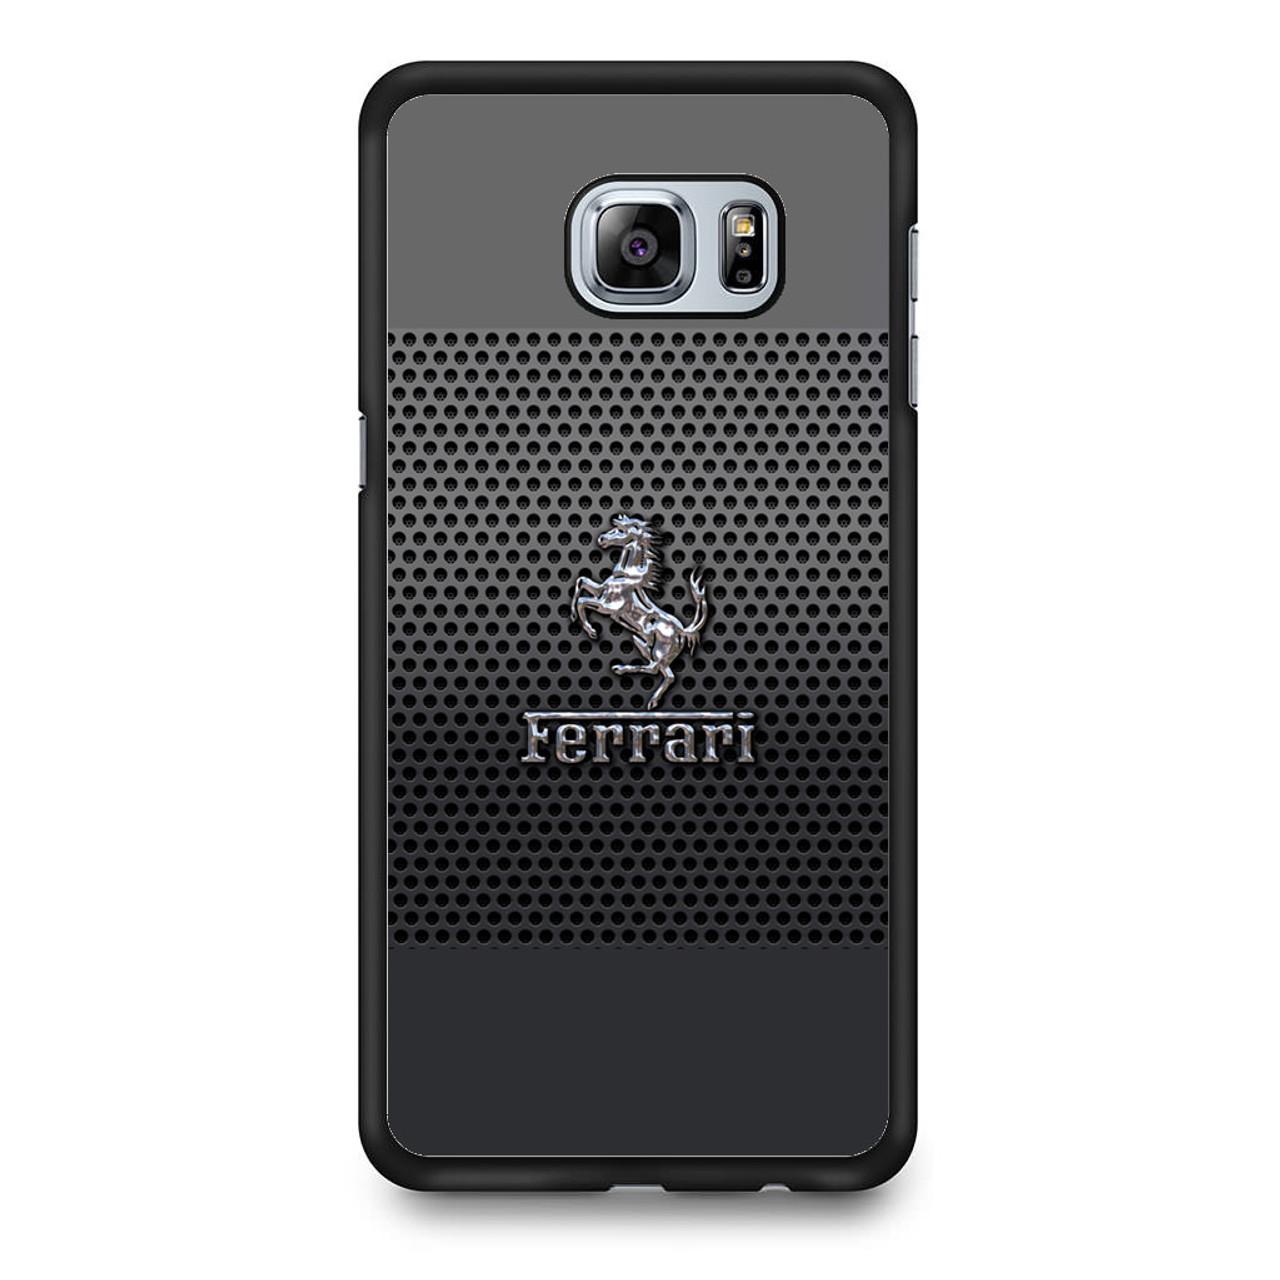 new style 4e4aa 30f9a Ferrari Chrome Logo Samsung Galaxy S6 Edge Plus Case